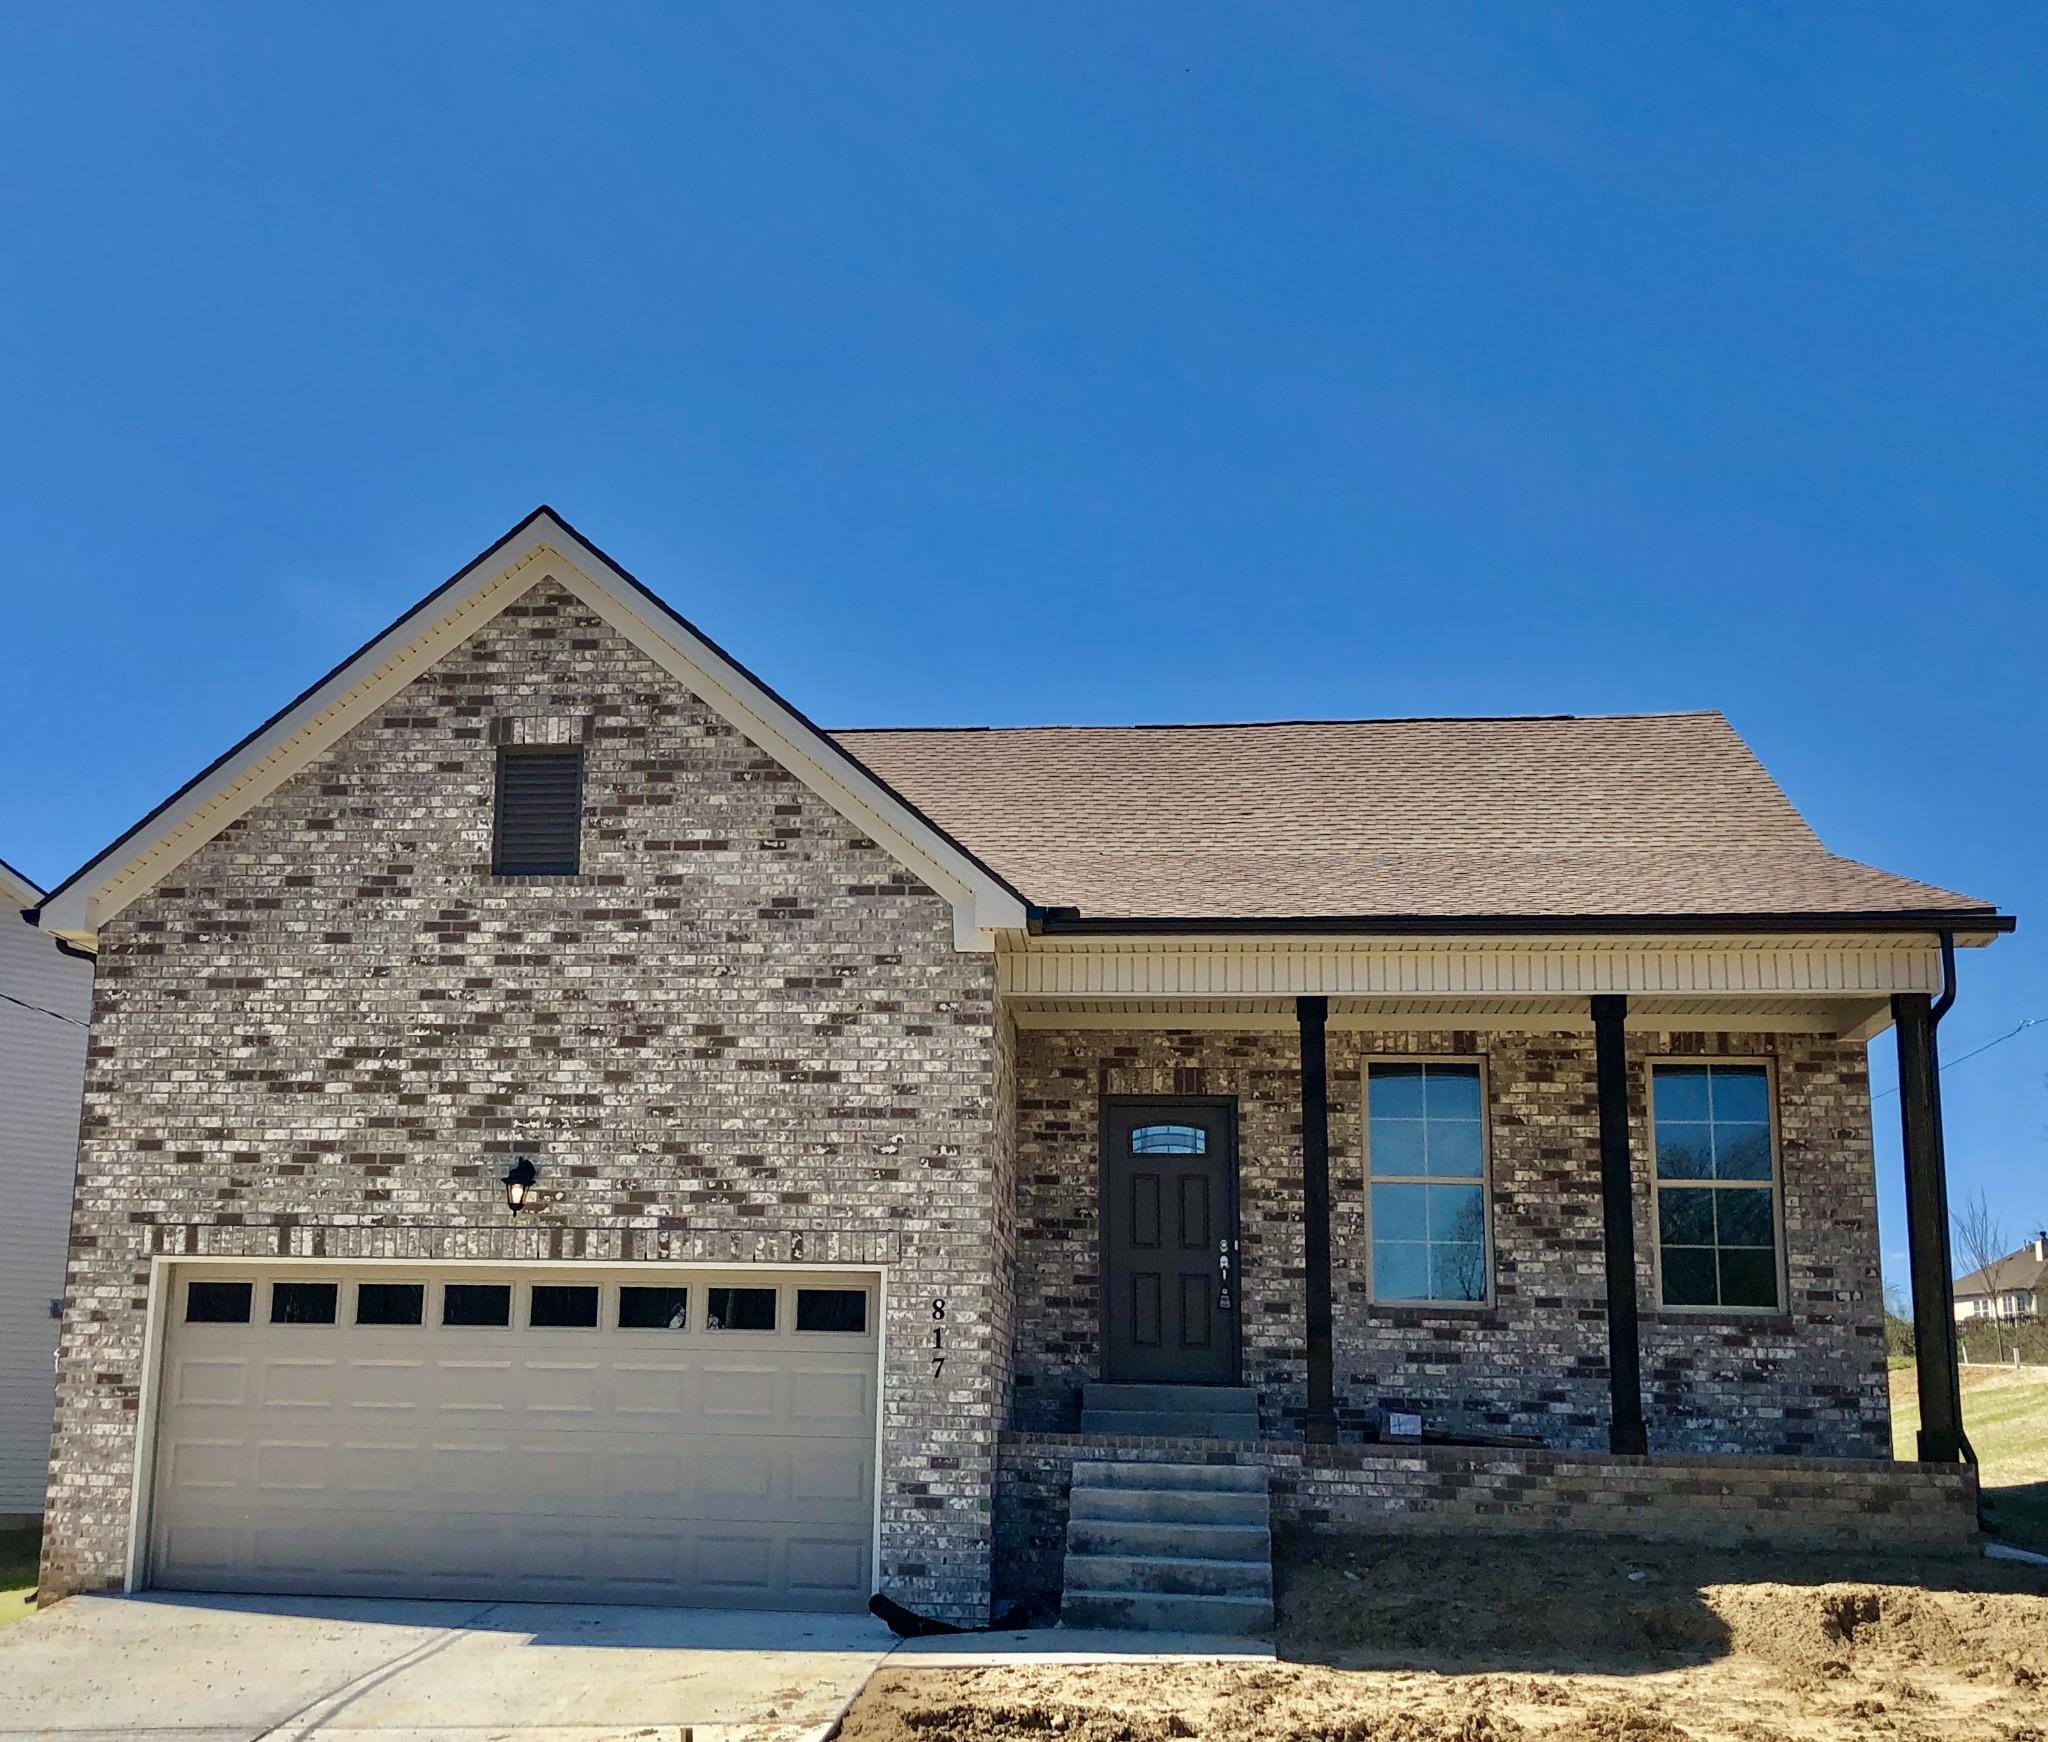 817 Bridge Creek Lane #162, Nashville-Antioch in Davidson County, TN County, TN 37013 Home for Sale